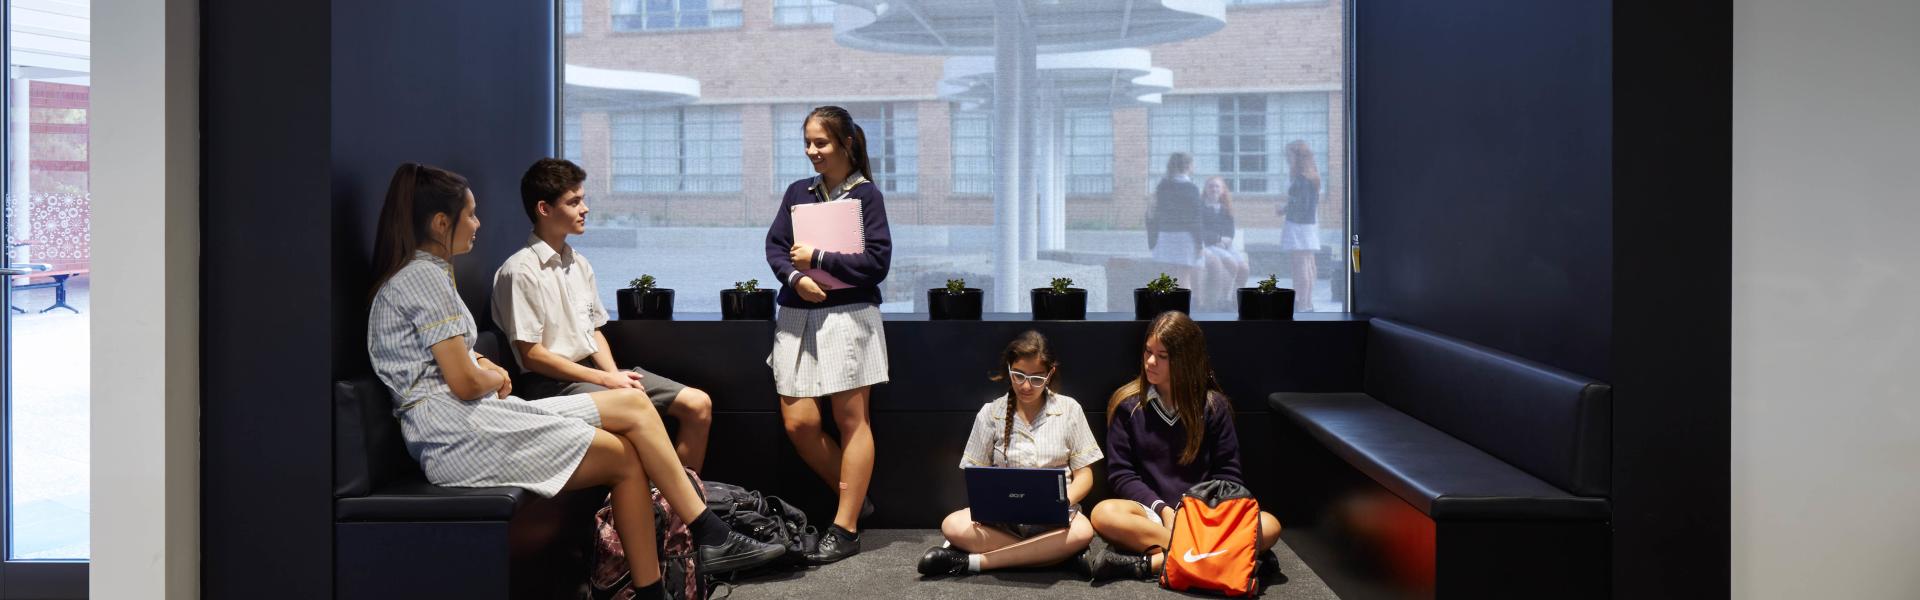 Adelaide-High-School-Lounge-Area